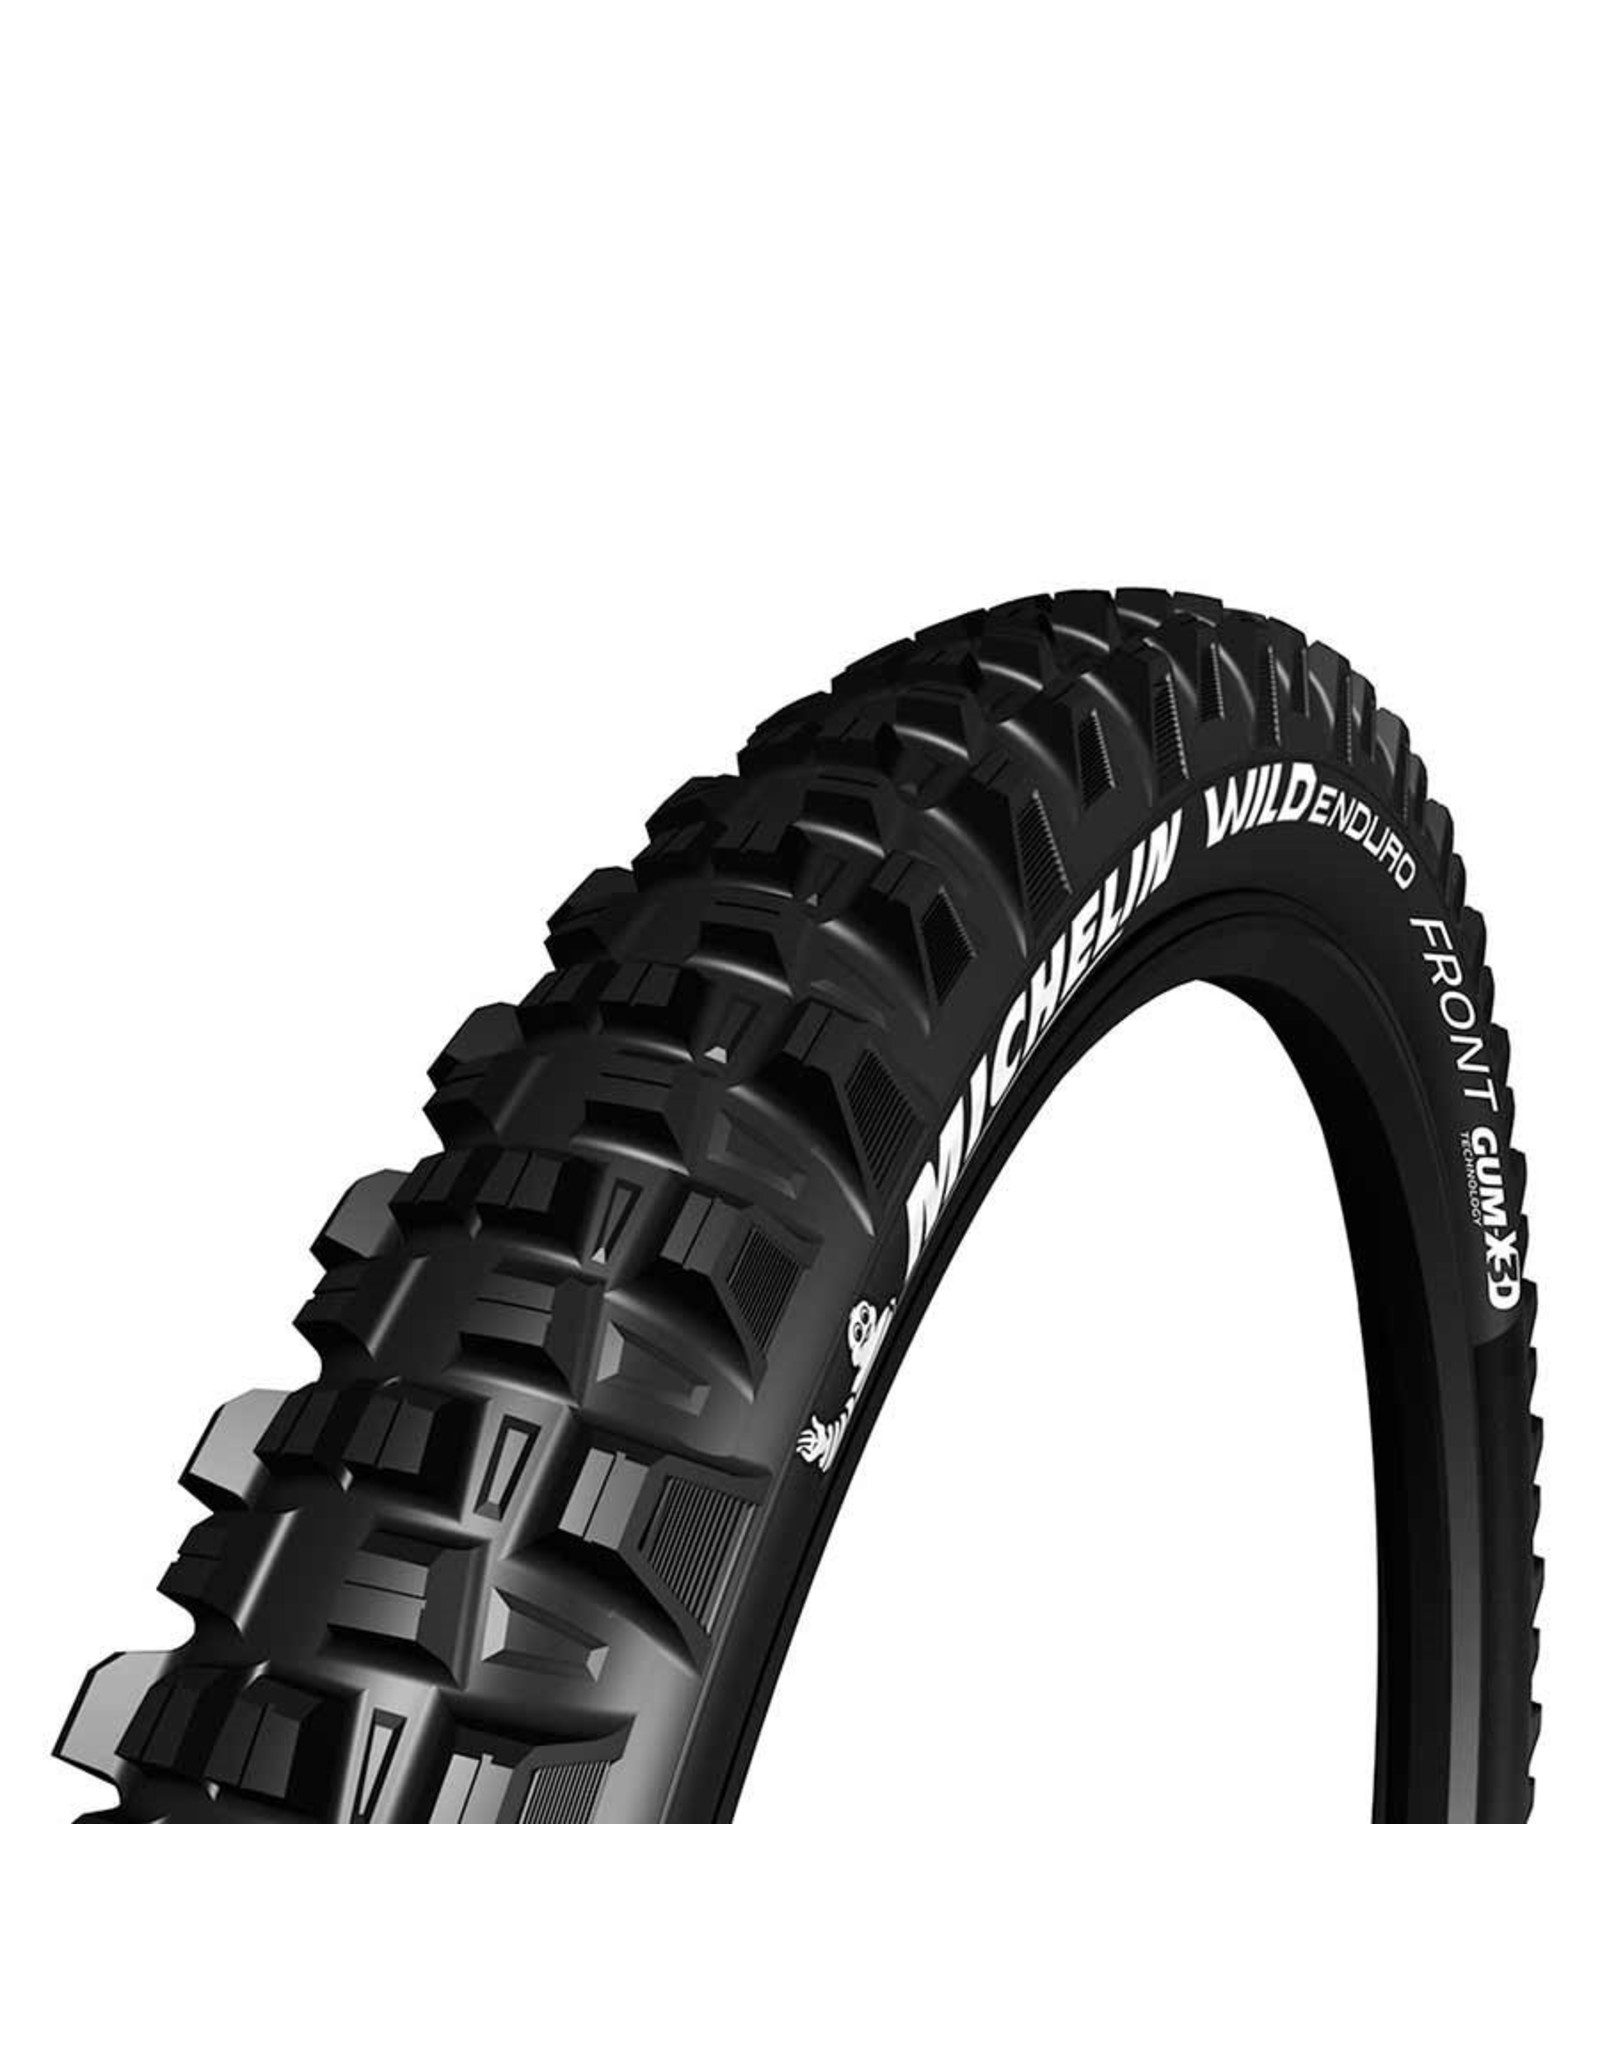 Michelin Wild Enduro Front, Tire, 27.5''x2.40, Folding, Tubeless Ready, GUM-X, GravityShield, 60TPI, Black